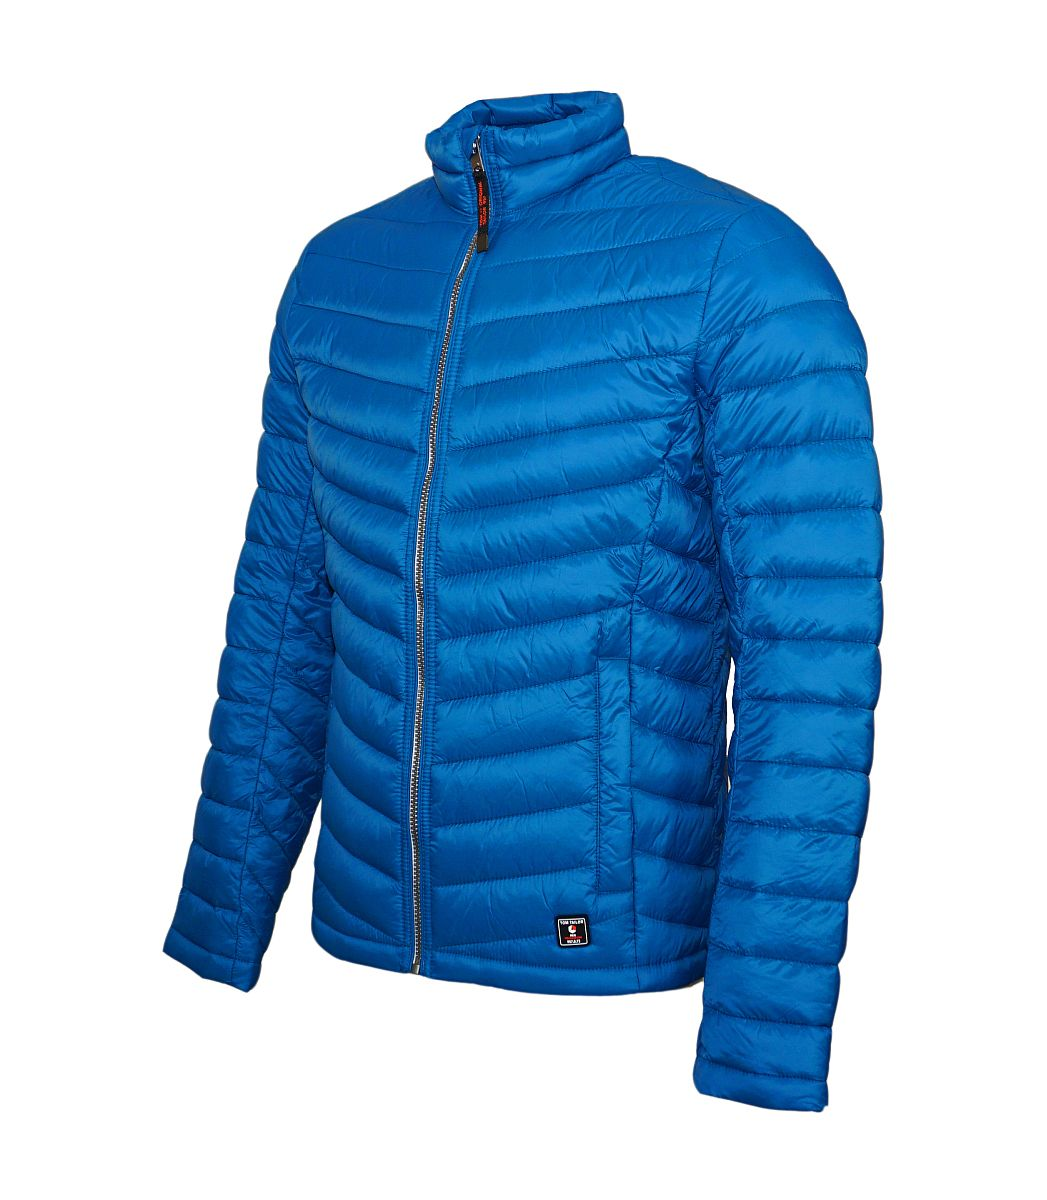 TTJ1 Jacket 6343 blau Tom 0110 Tailor Jacke SH17 Lightweight 3533475 Daunenjacke hsQdtCxoBr